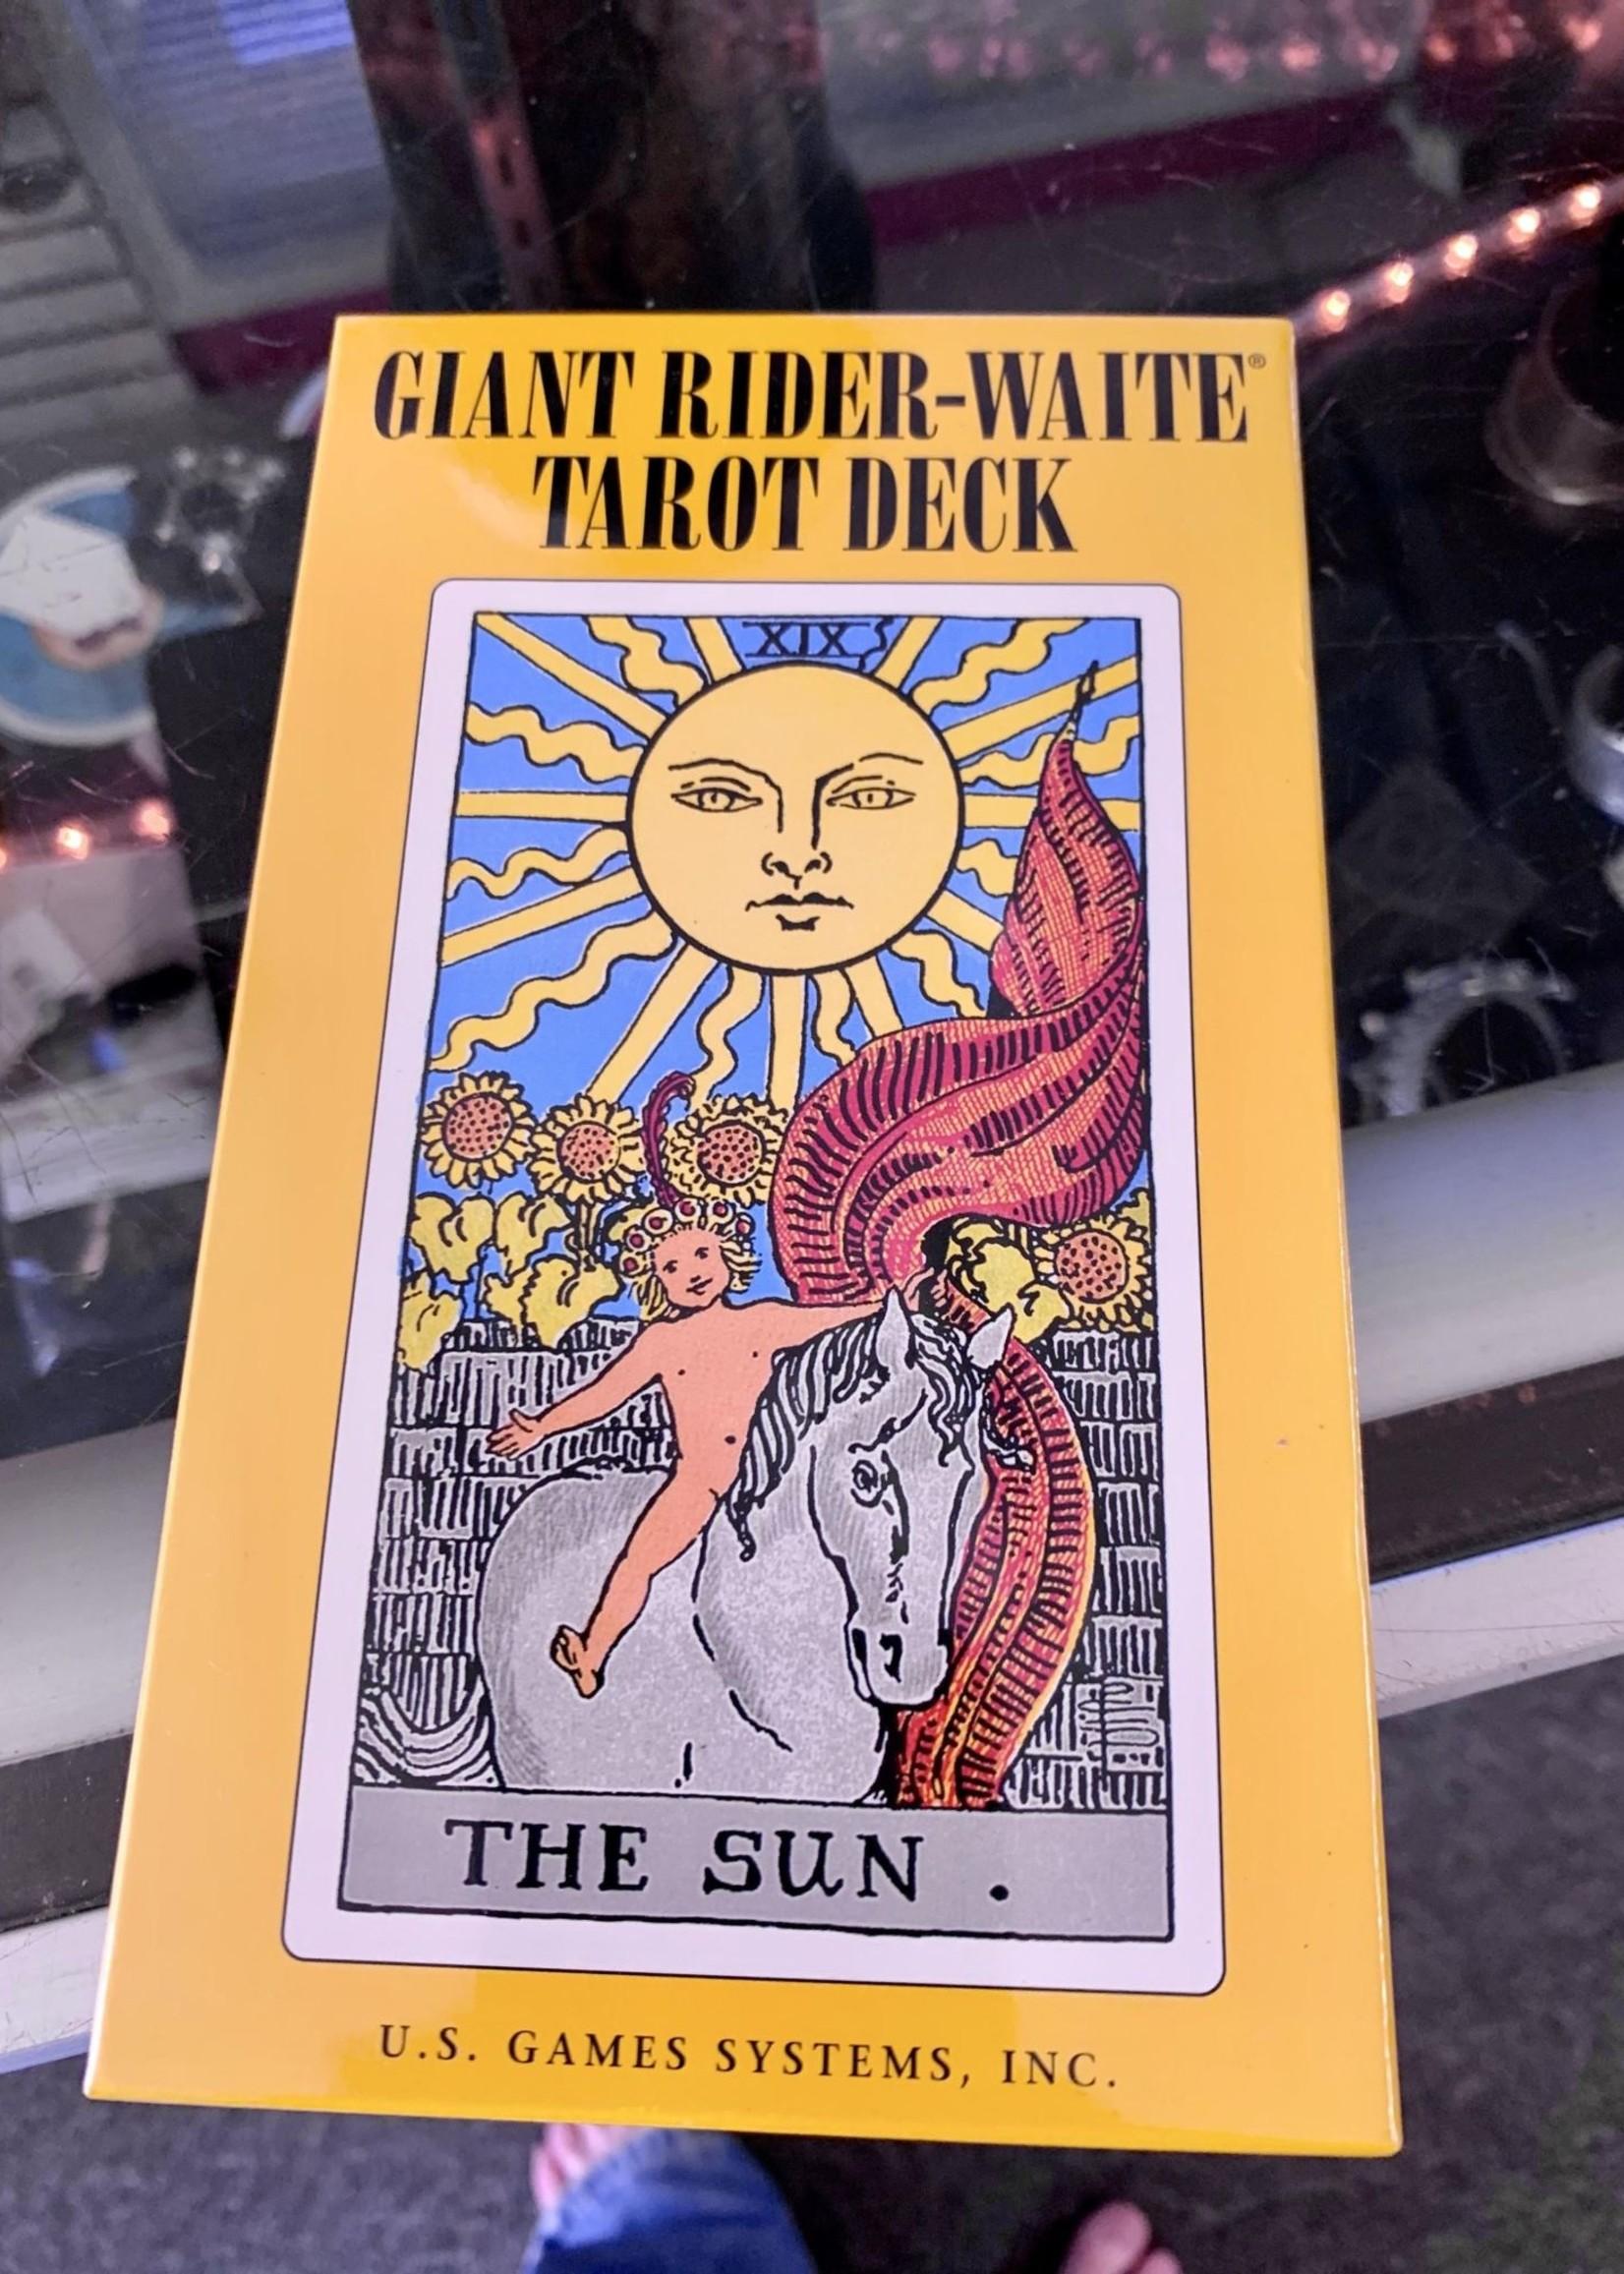 Giant Rider-Waite Tarot Deck